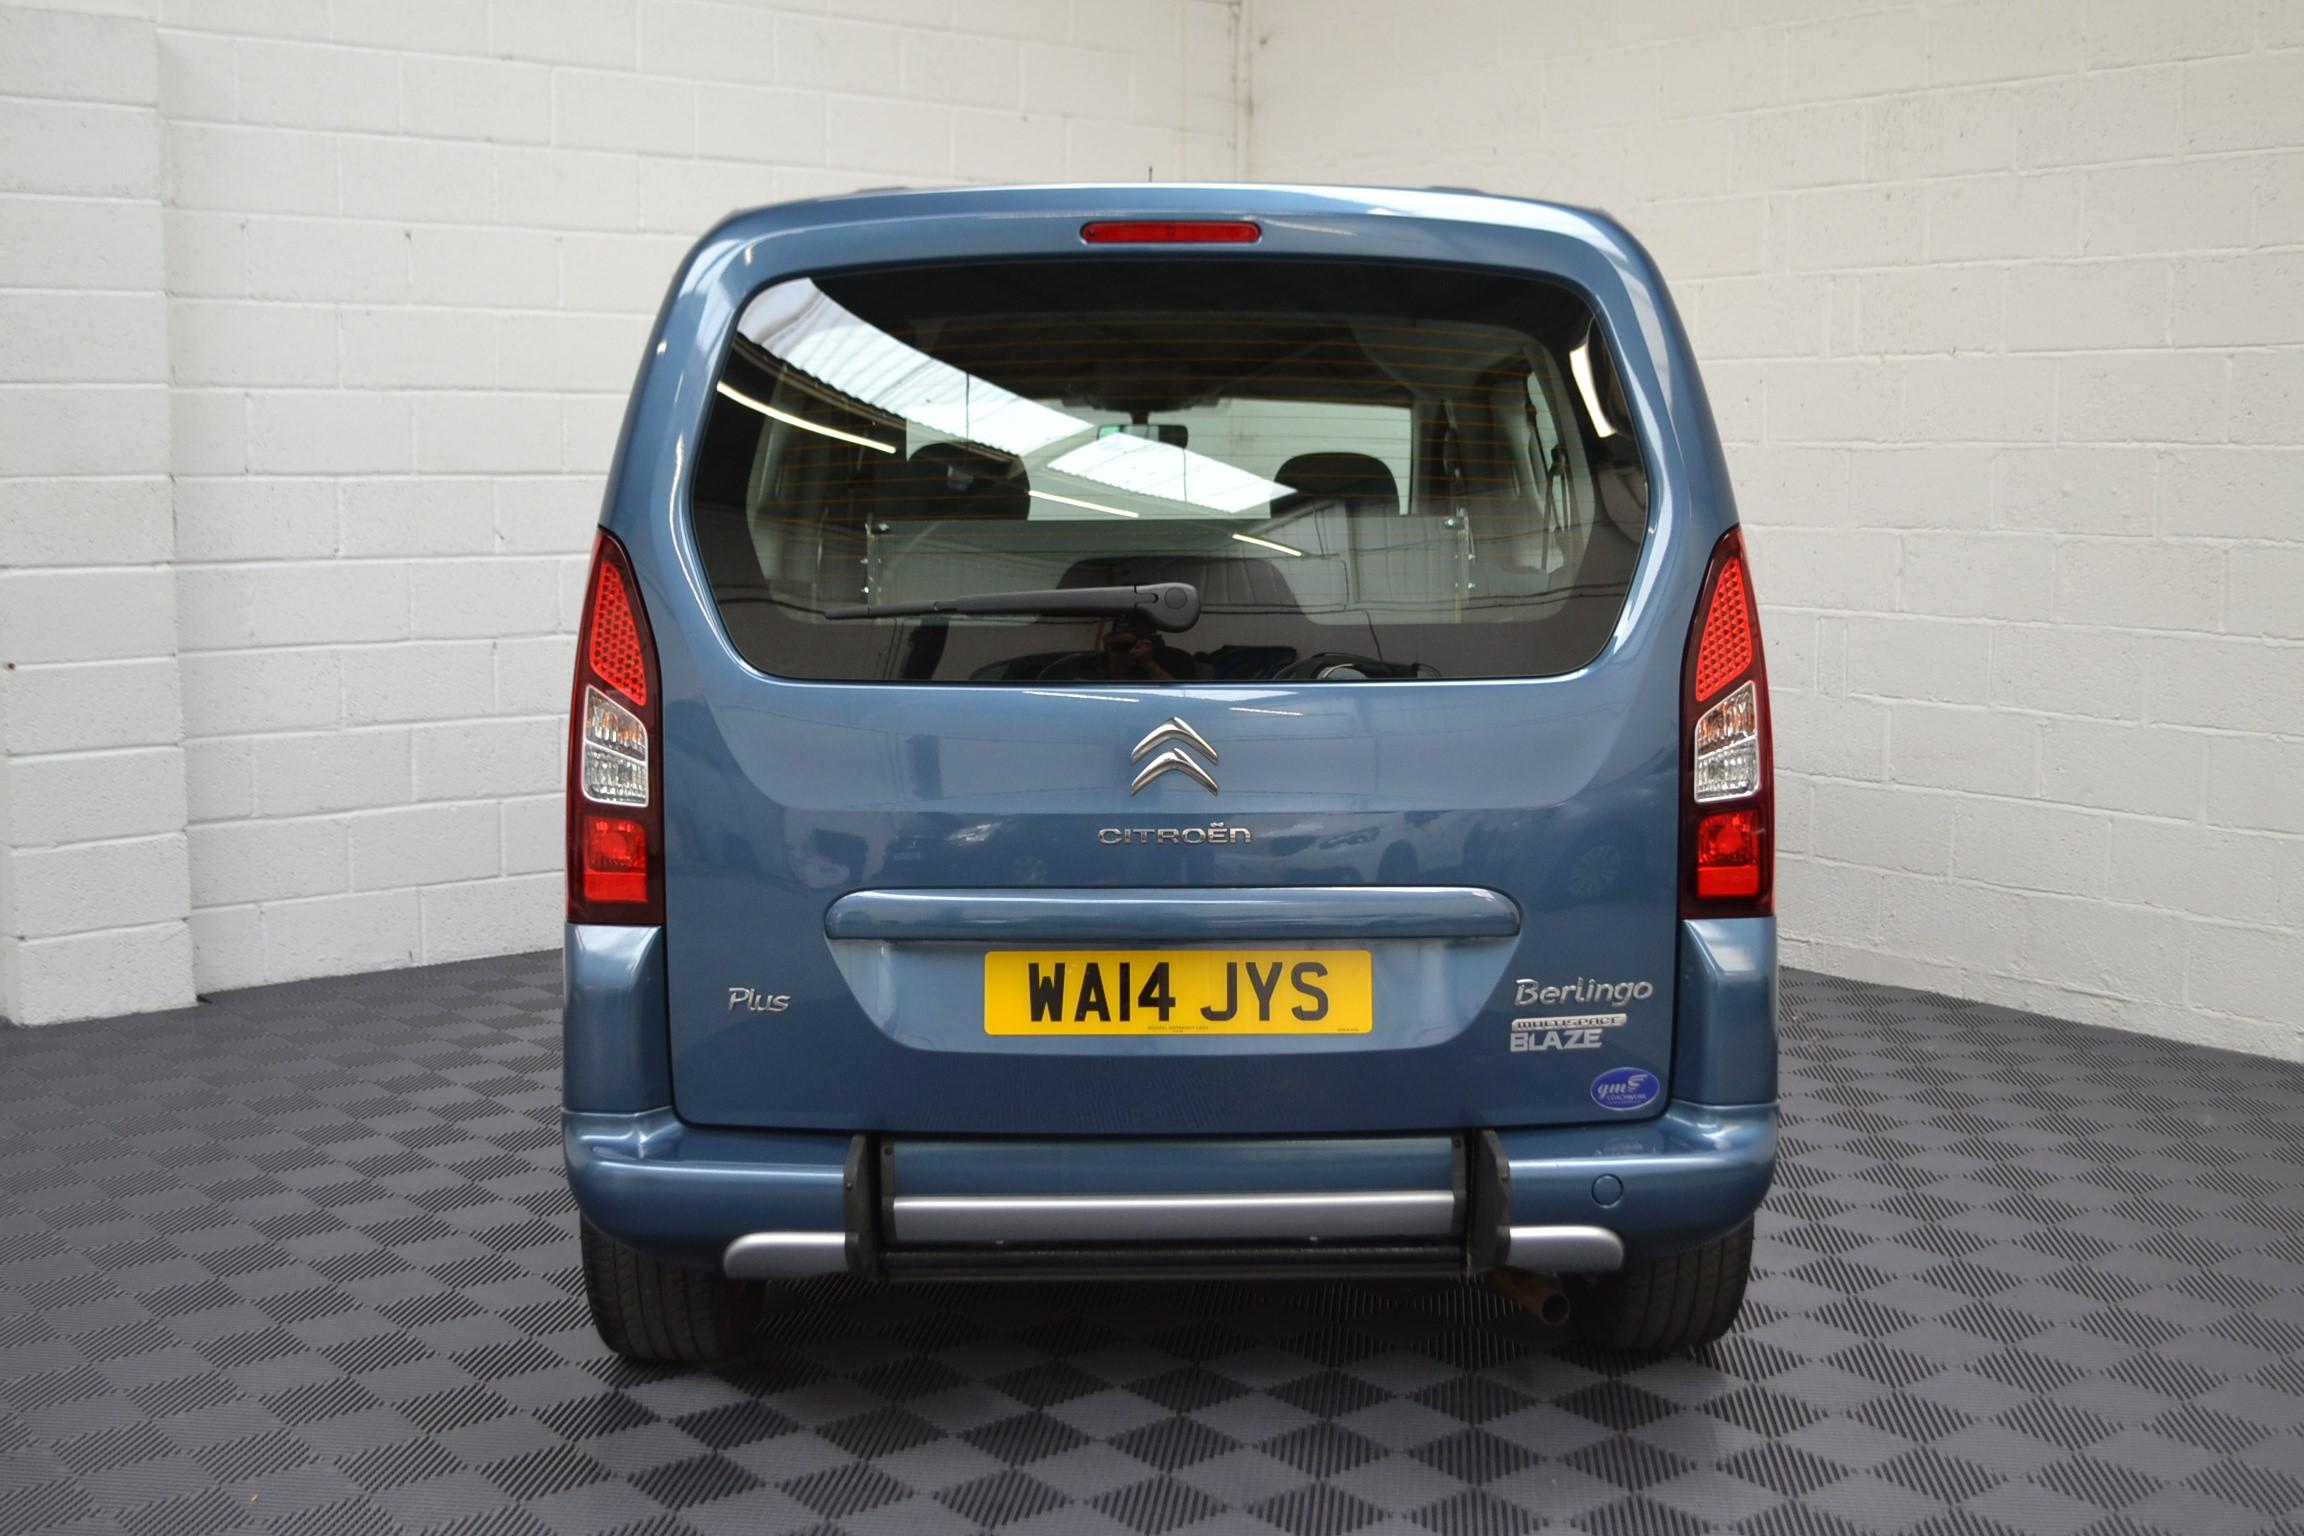 WAV Cars For Sale Bristol Wheelchair Accessible Vehicles Used For Sale Somerset Devon Dorset Bath Citroen Berlingo WA14 JYS 4